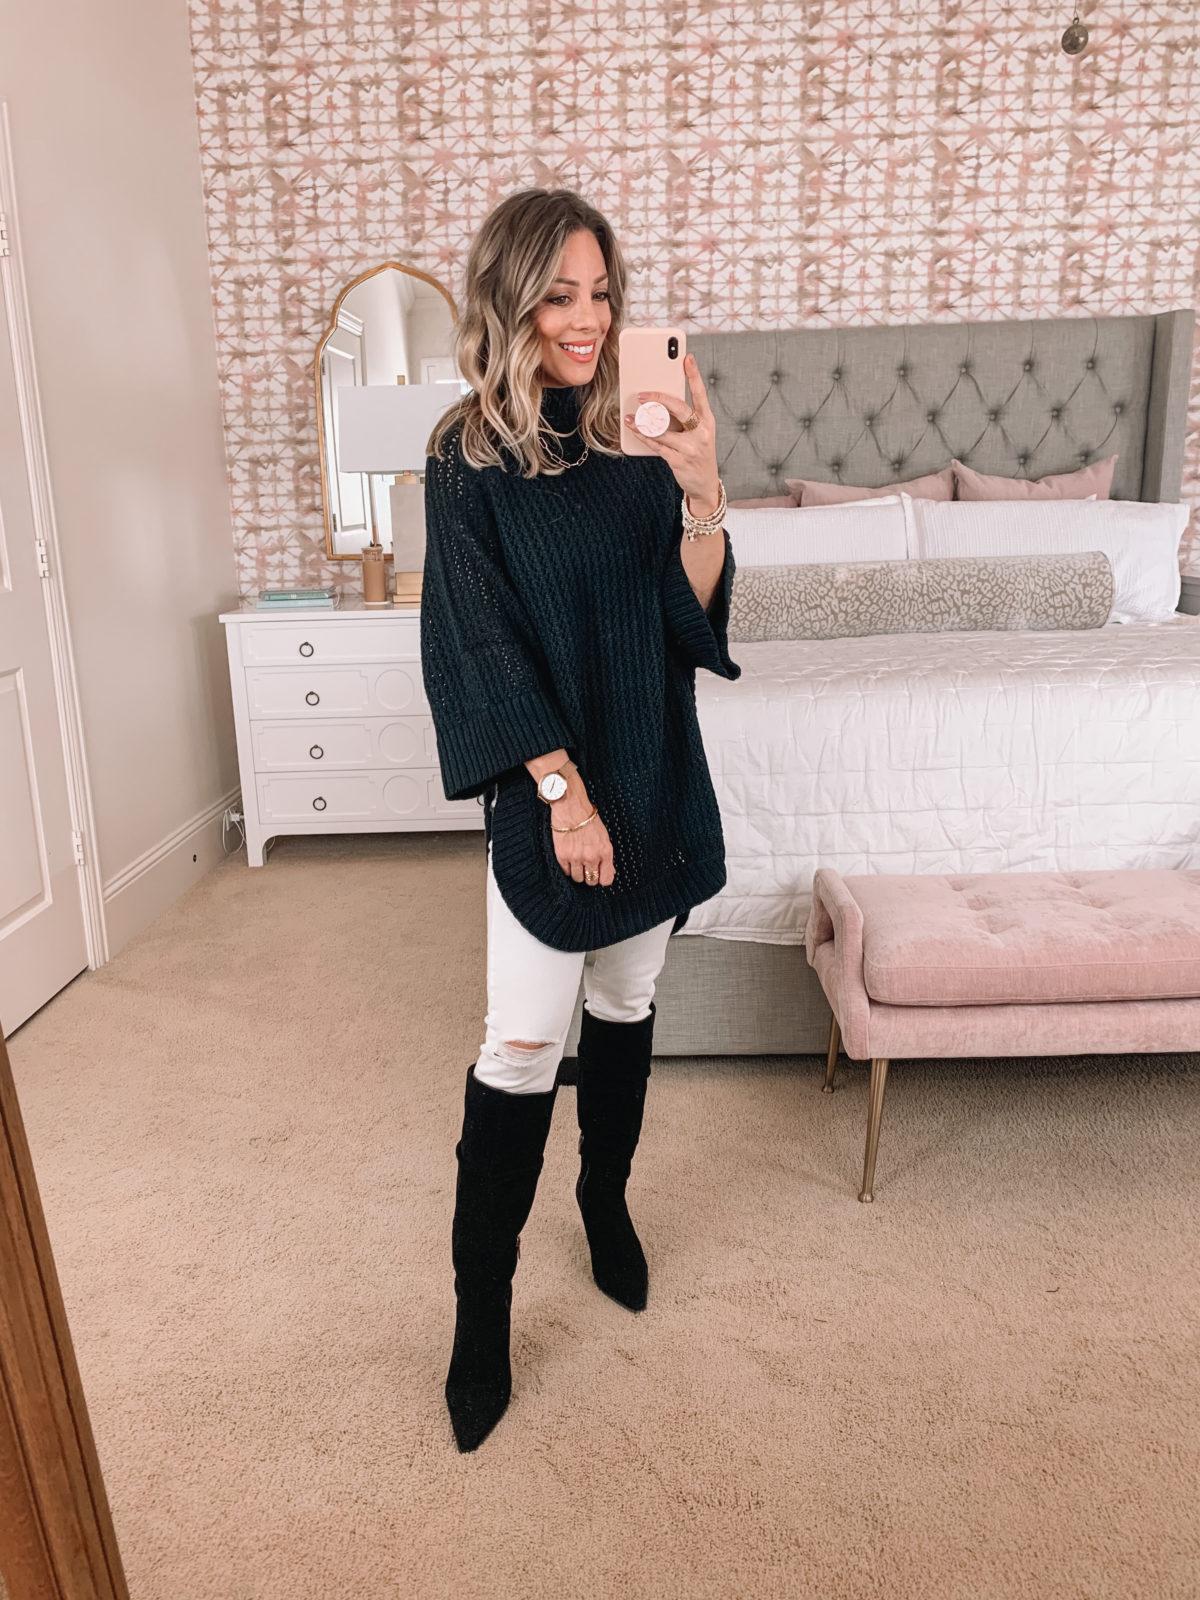 Amazon Fashion Faves, Poncho, White Jeans, Boots